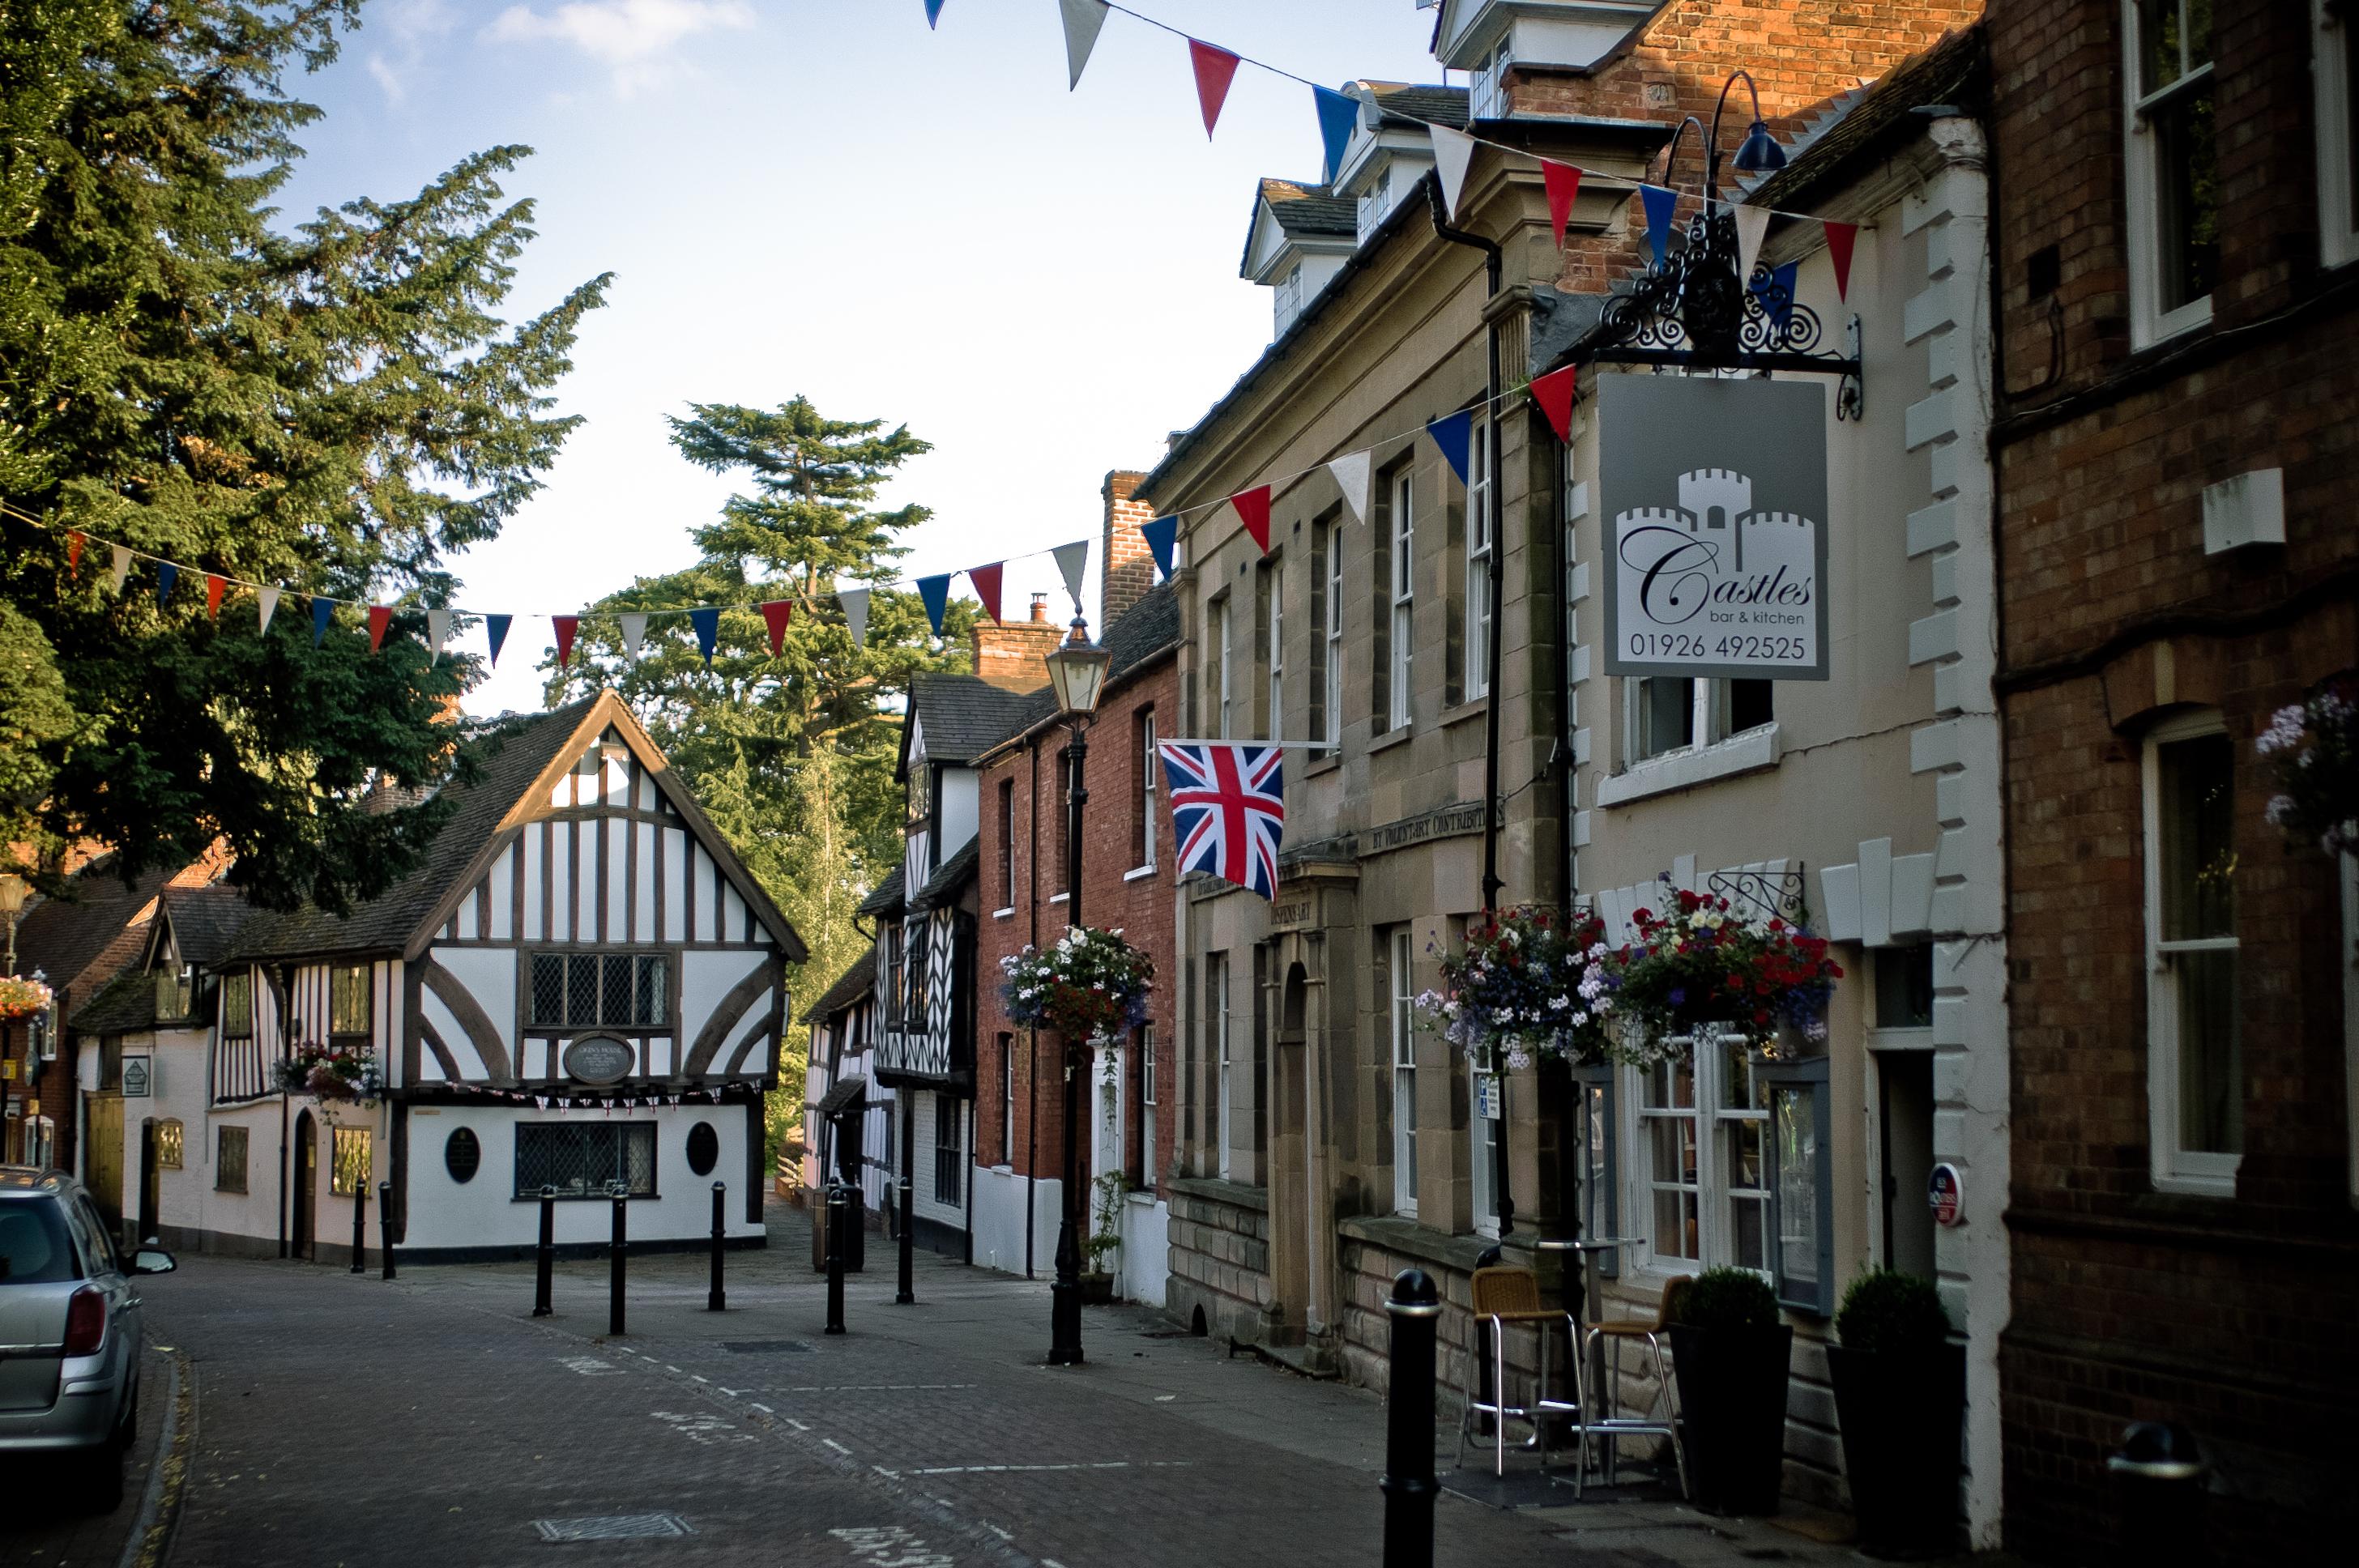 libelle   united kingdom   reizen amp vrije tijdwarwick town